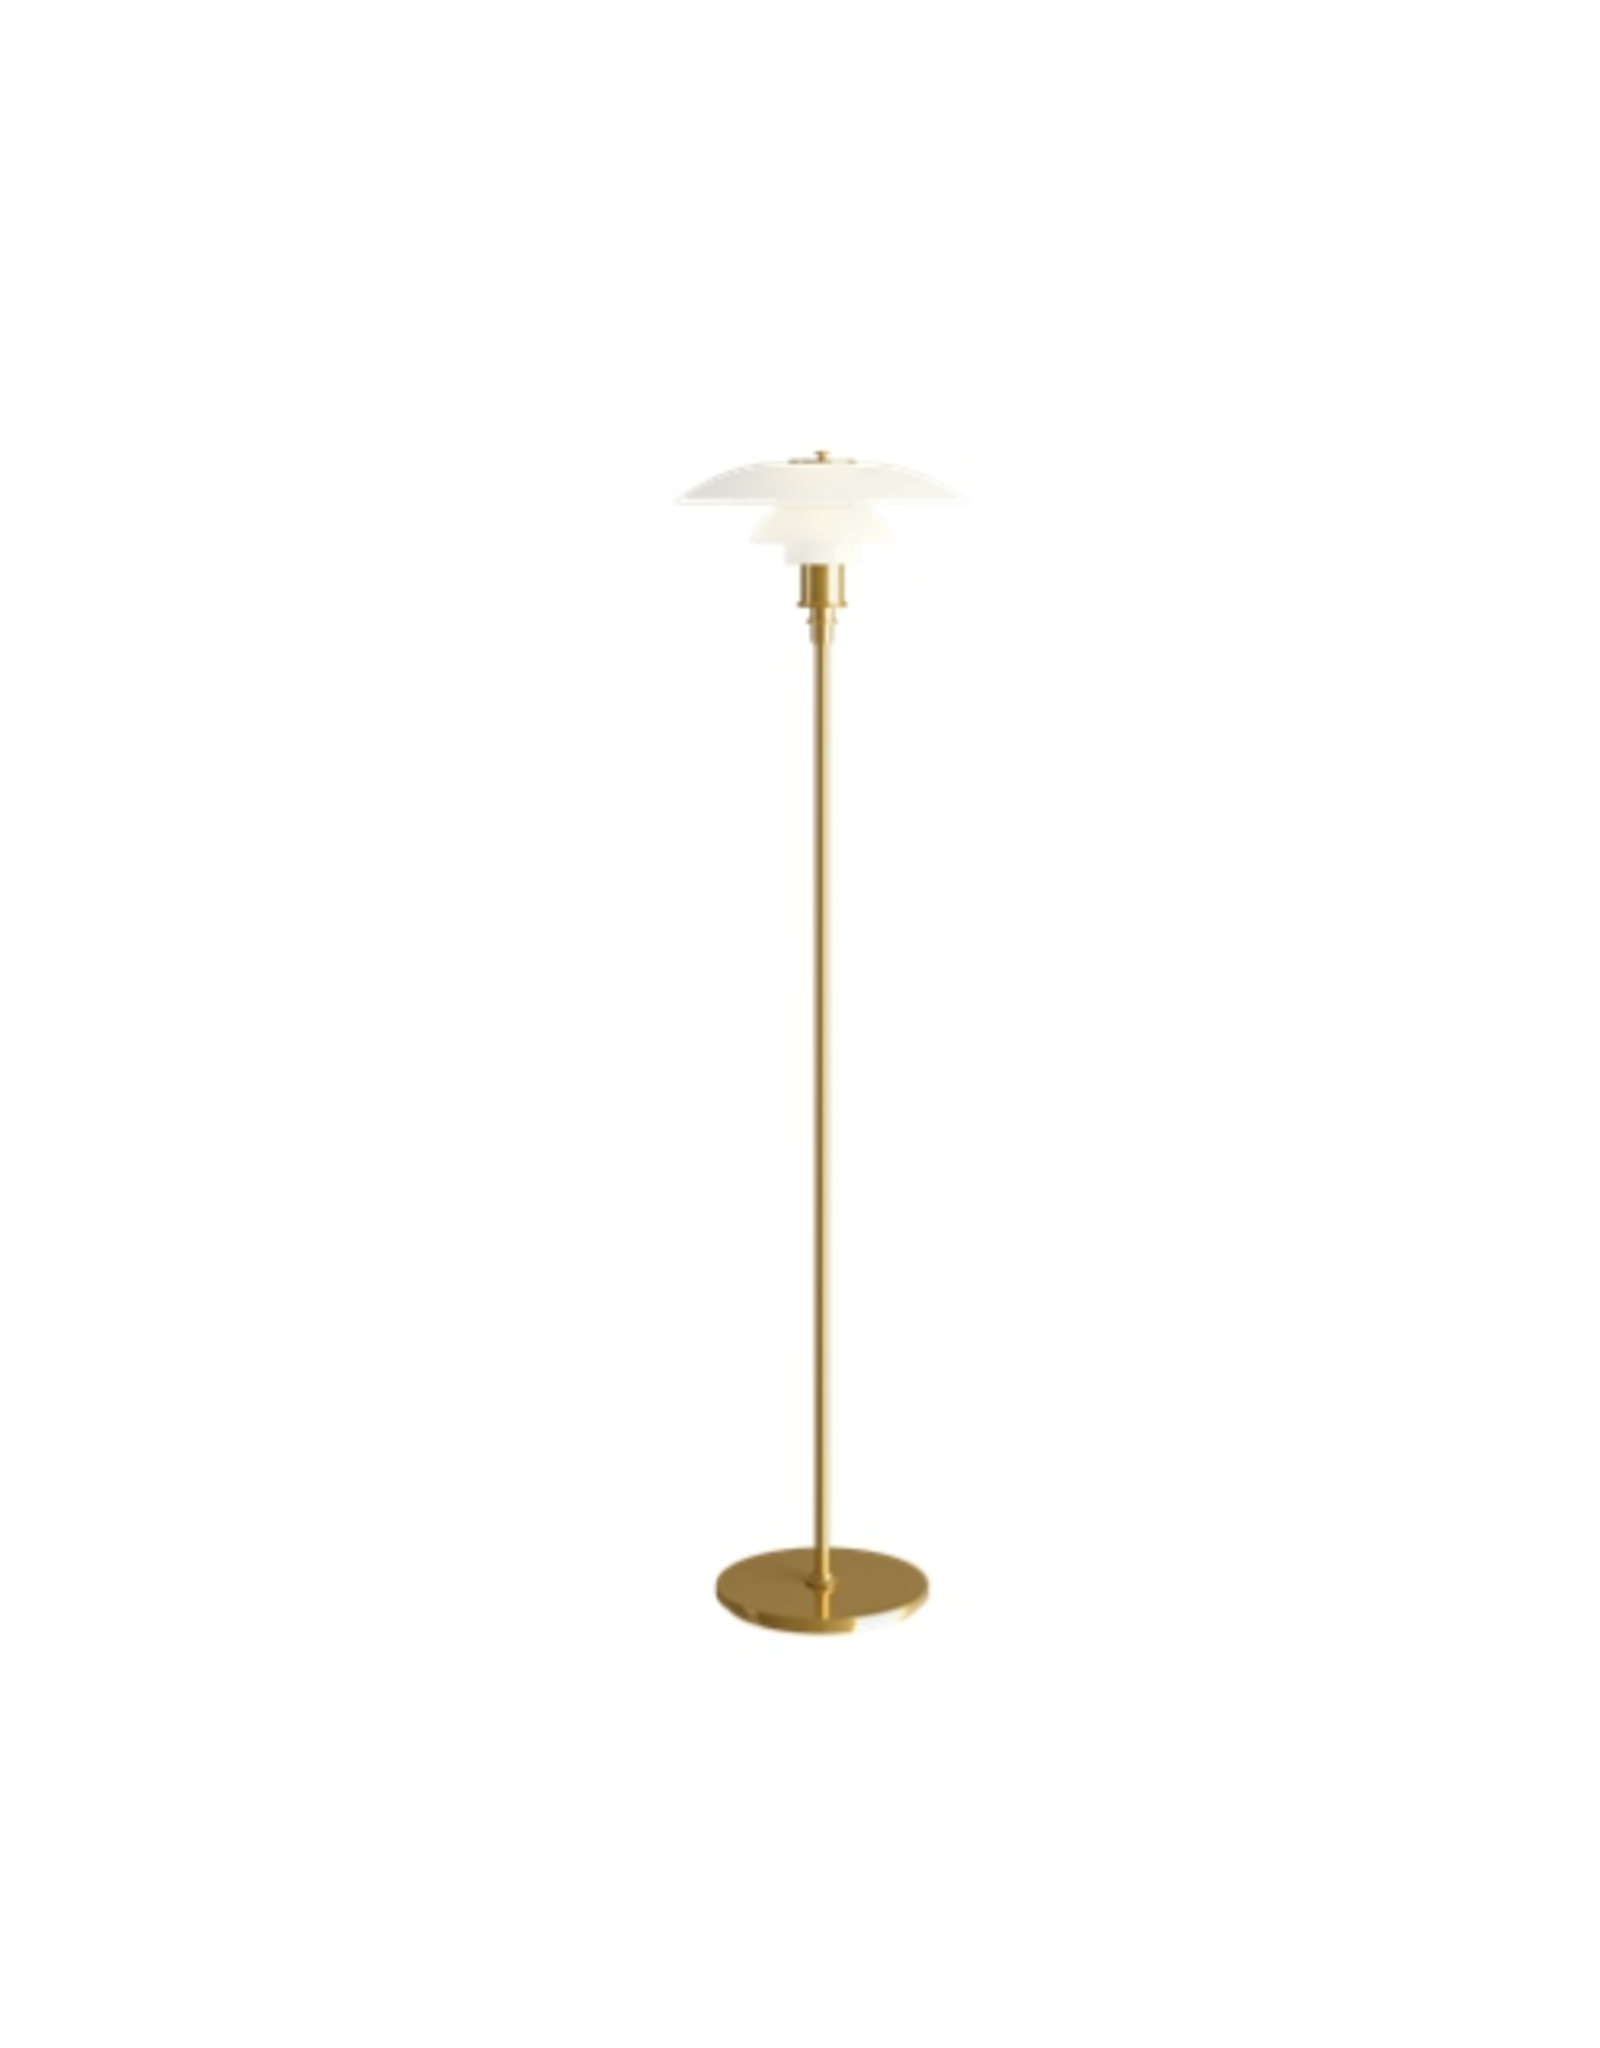 PH 3 1/2-2 1/2 蛋白石玻璃燈罩黃銅色燈柱落地燈